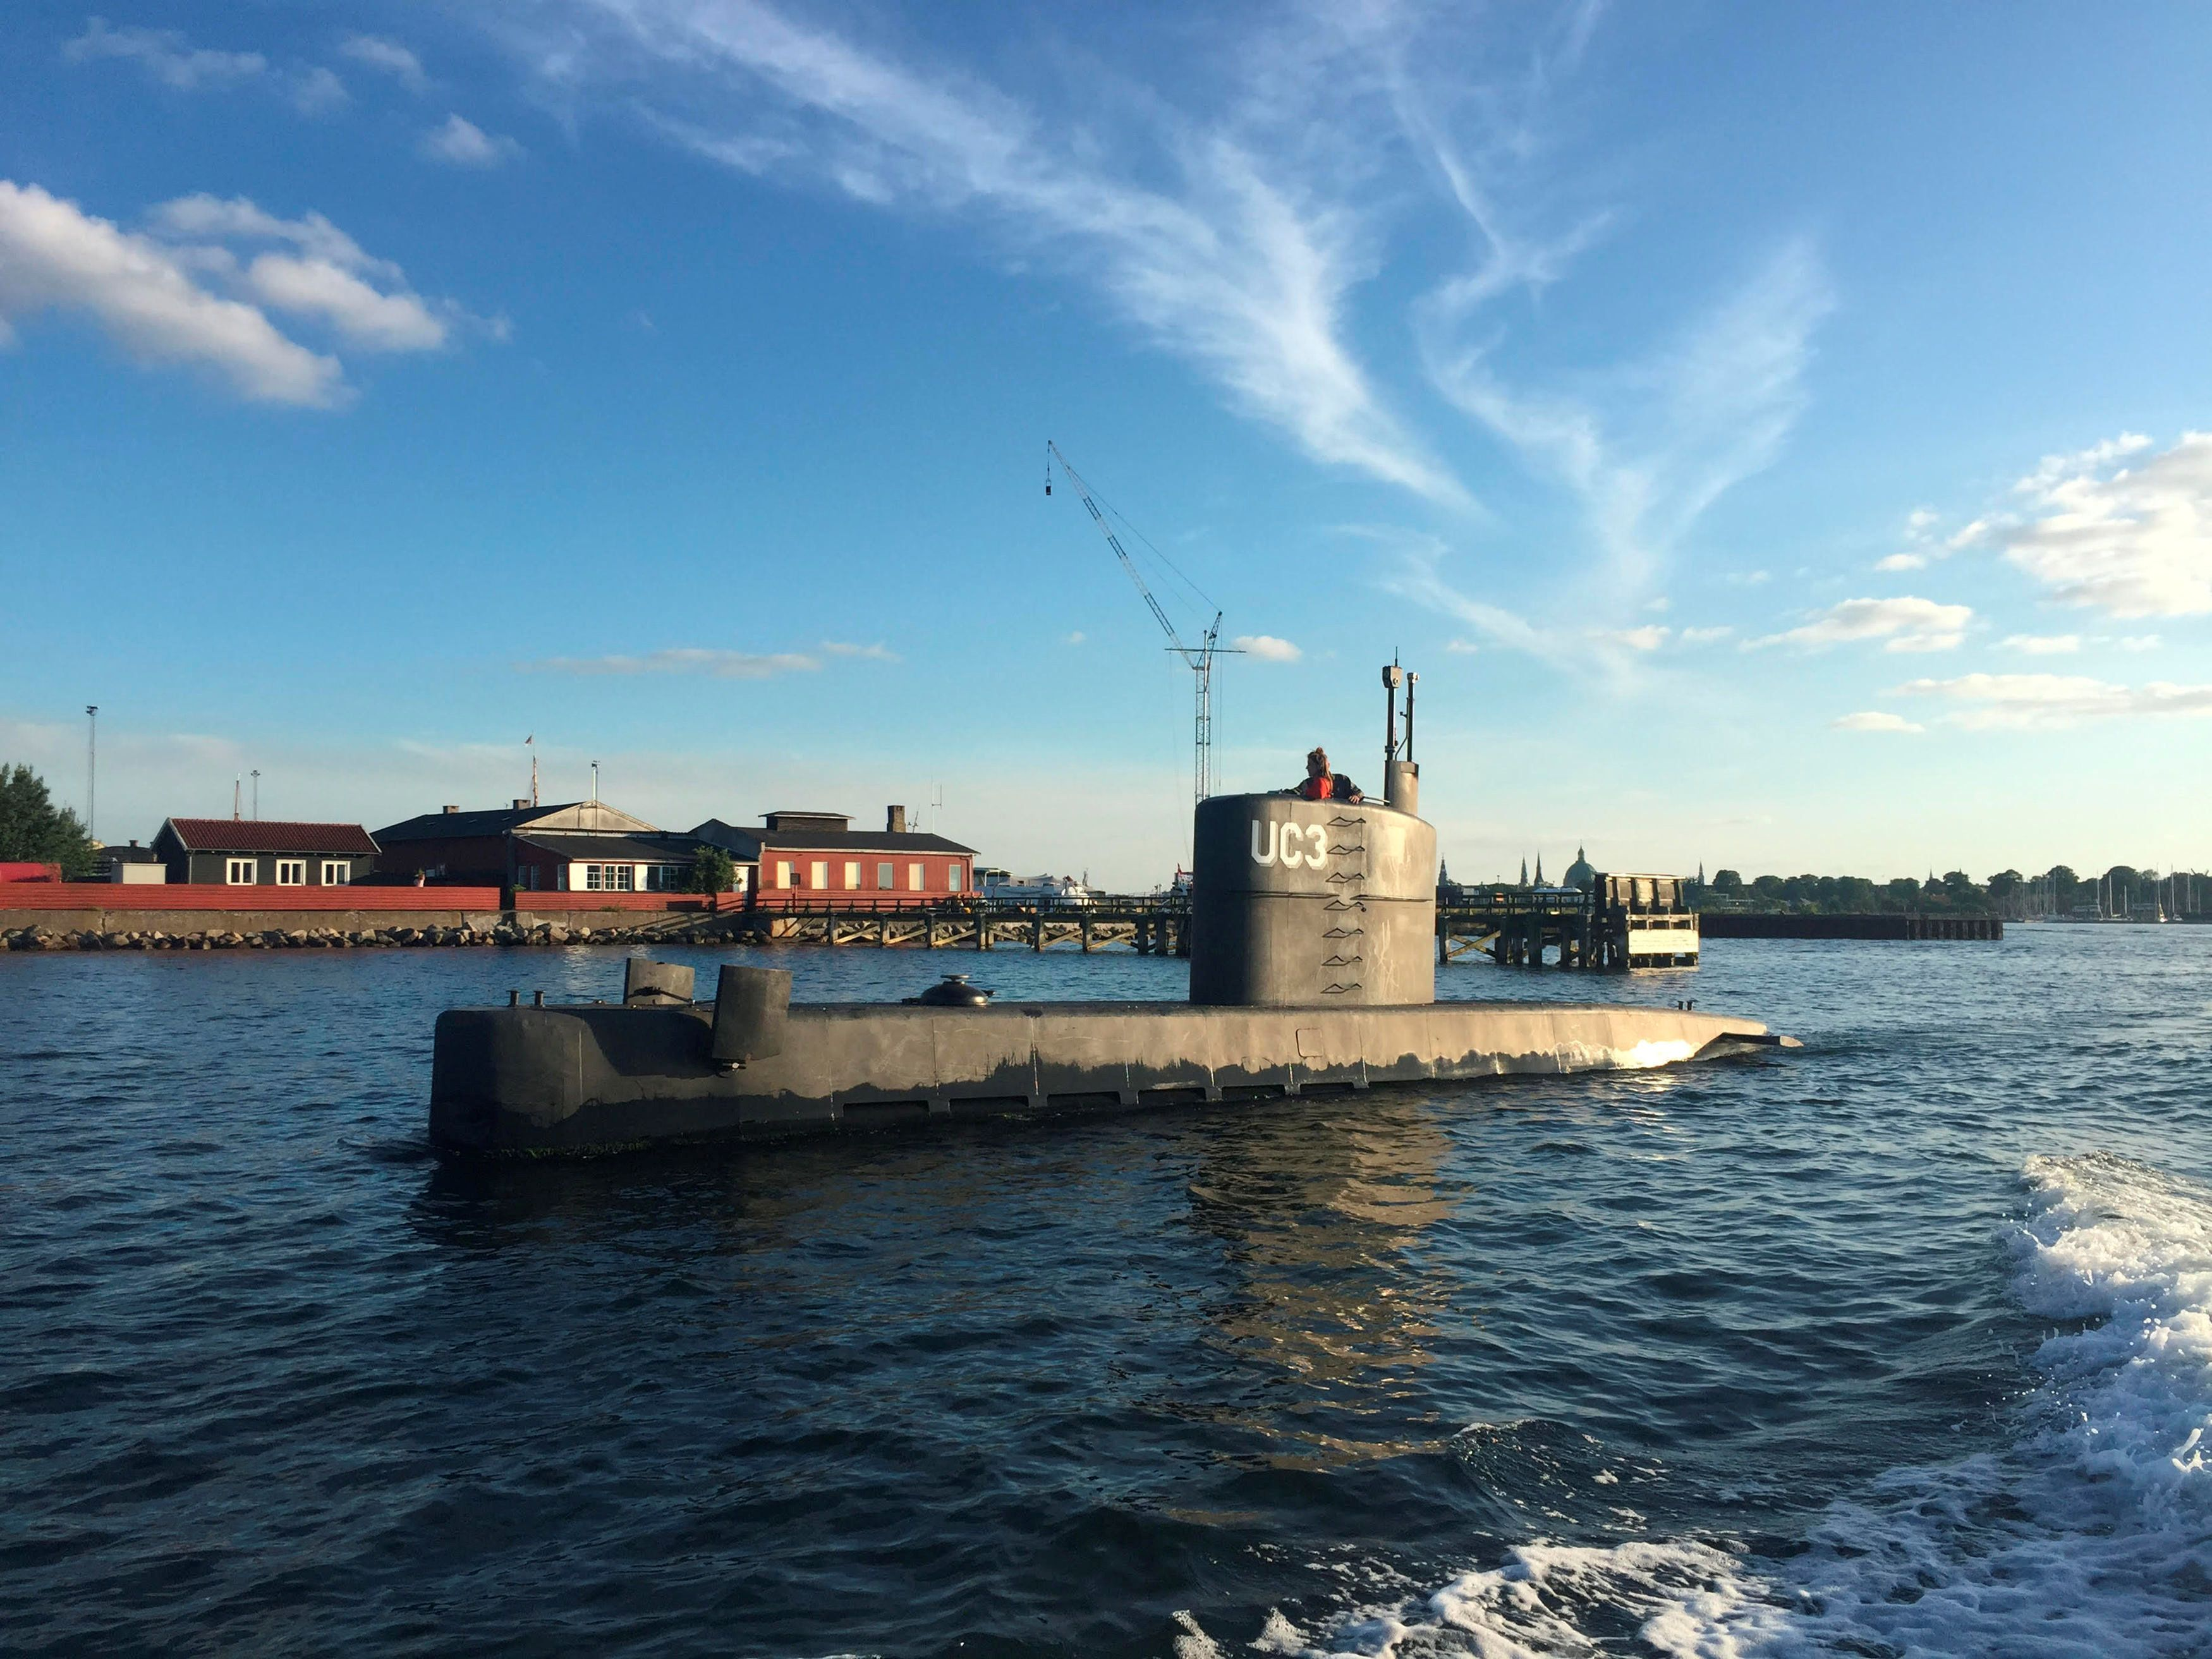 The UC3 Nautilus is seenin Copenhagen Harbor, Denmark, on Aug. 11, 2017.